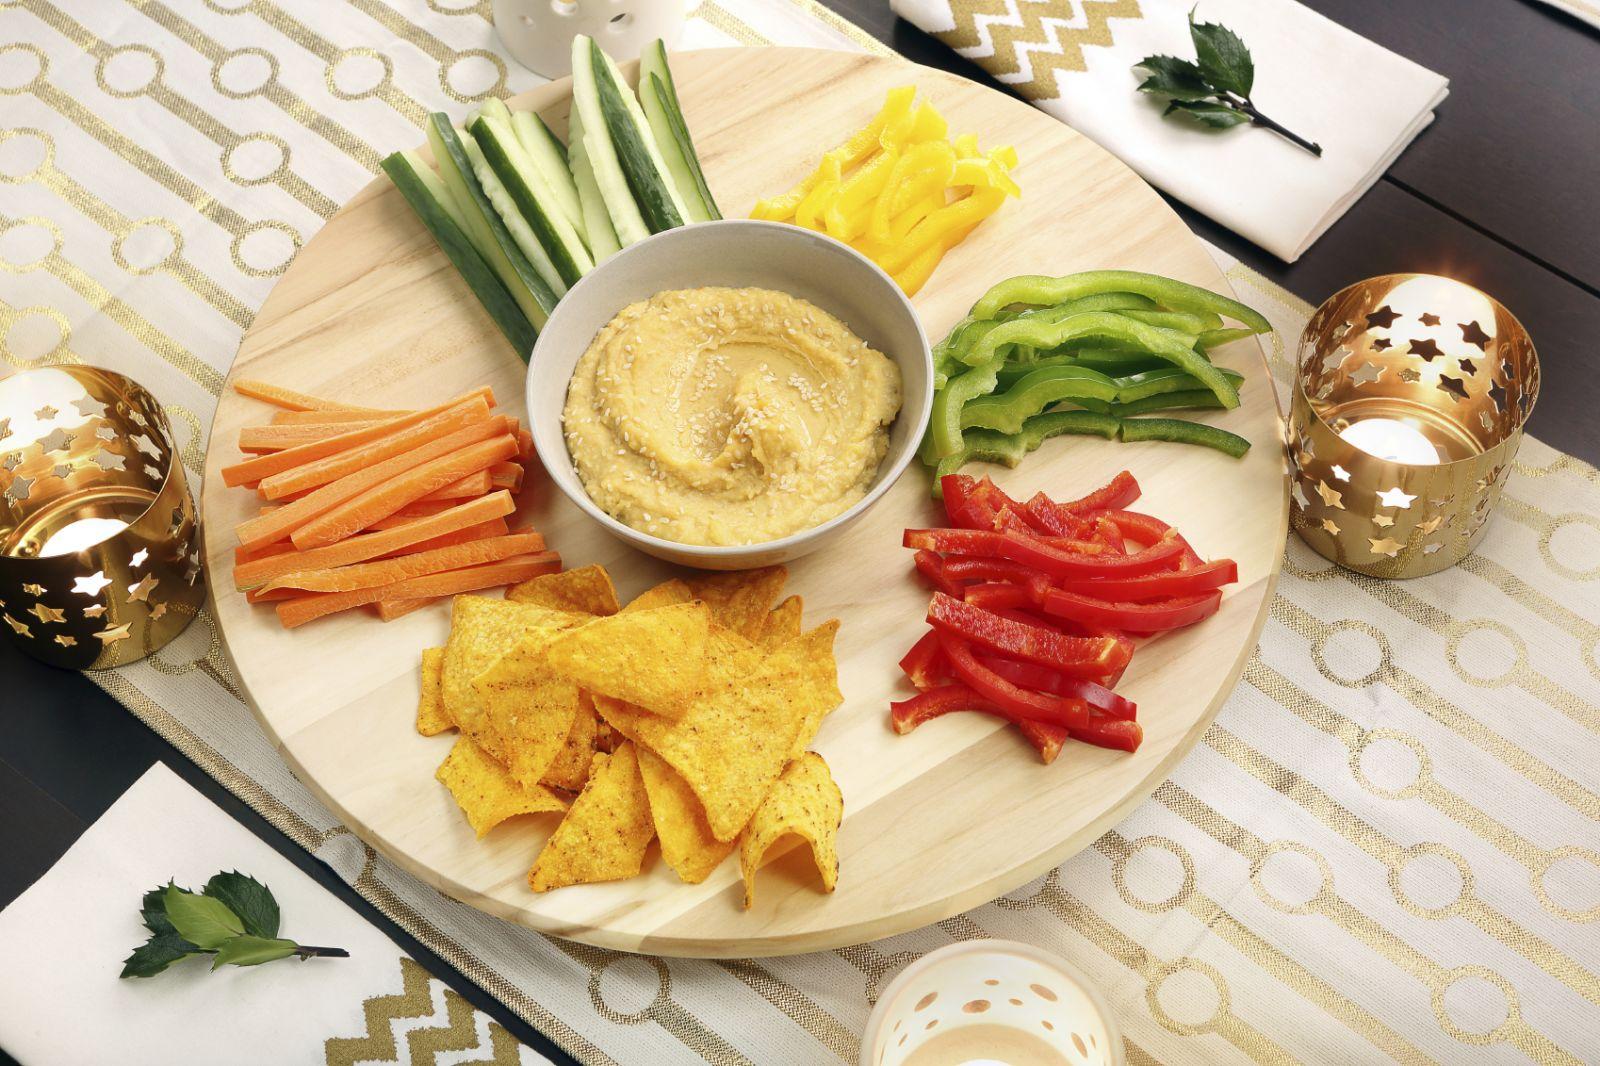 IStock 000055379720 Hummus.jpg